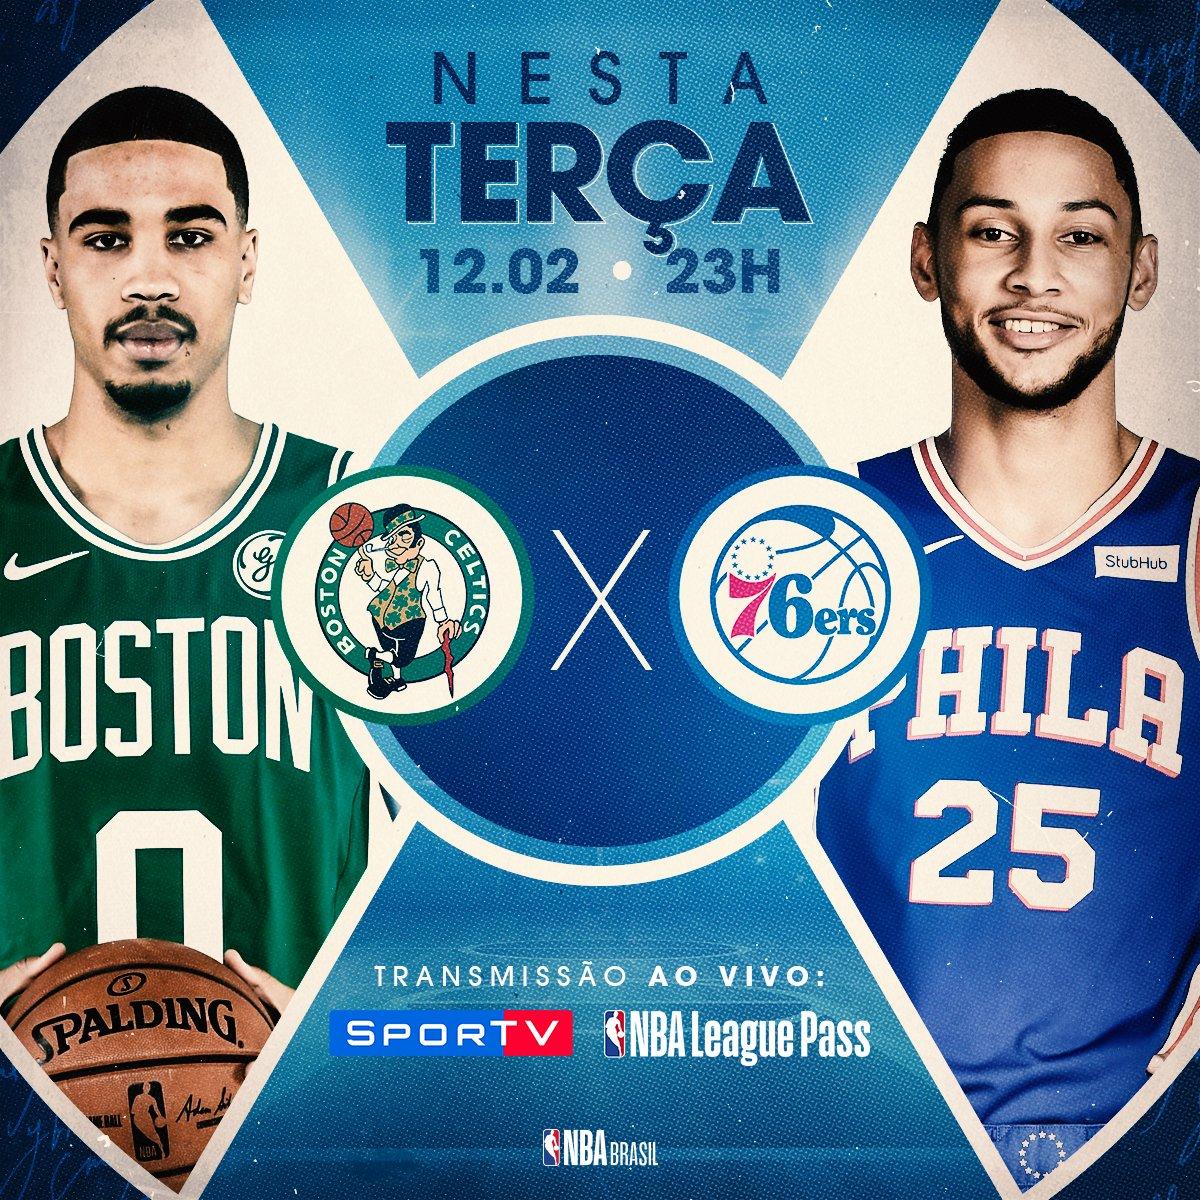 Tem jogo treta pela temporada regular da #NBA entre #BostonCeltics de #KyrieIrving vs #Philadelphia76ers do #AllStar #BenSimmons #CUsRise #HereTheyCome #BOSvsPHI #NBAnoSporTV #NBAAllStar #JoelEmbiid #JasonTatum #TDGarden #NBATwitter #Basketball #Celtics #76ers